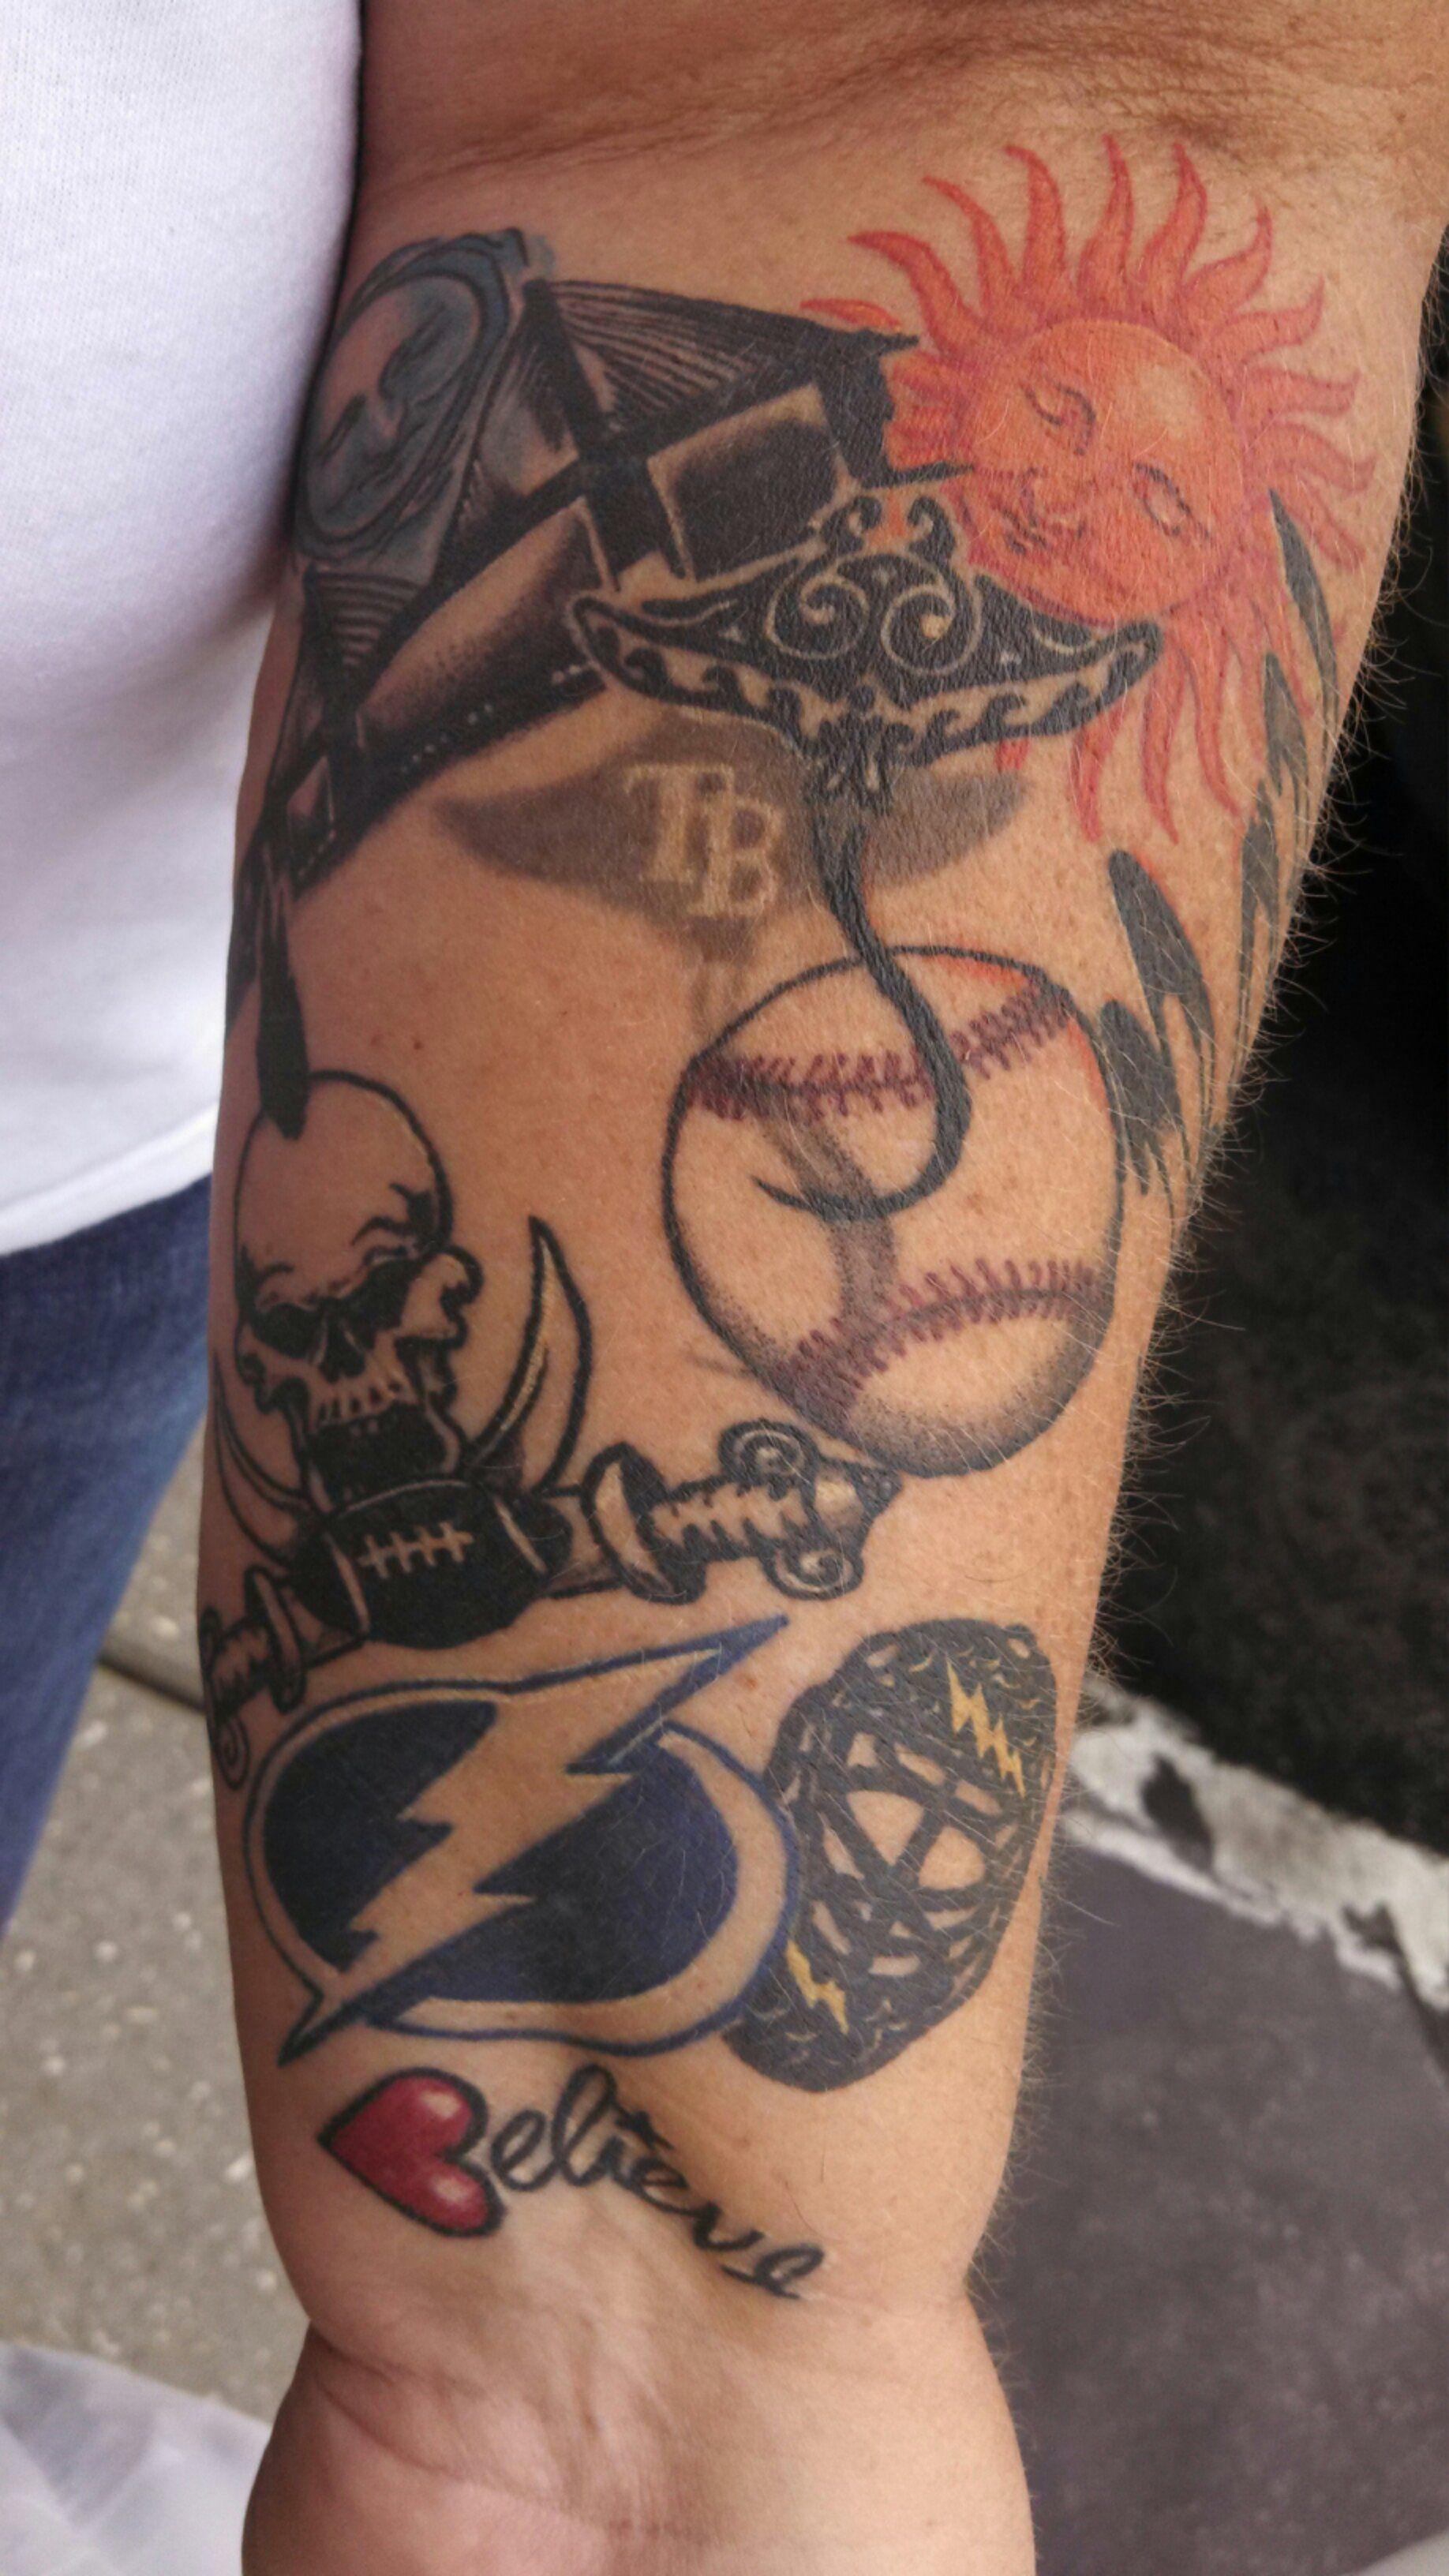 Tampa Bay Buccaneers Tattoos Images Google Search Tattoos Florida Tattoos Tattoo Images